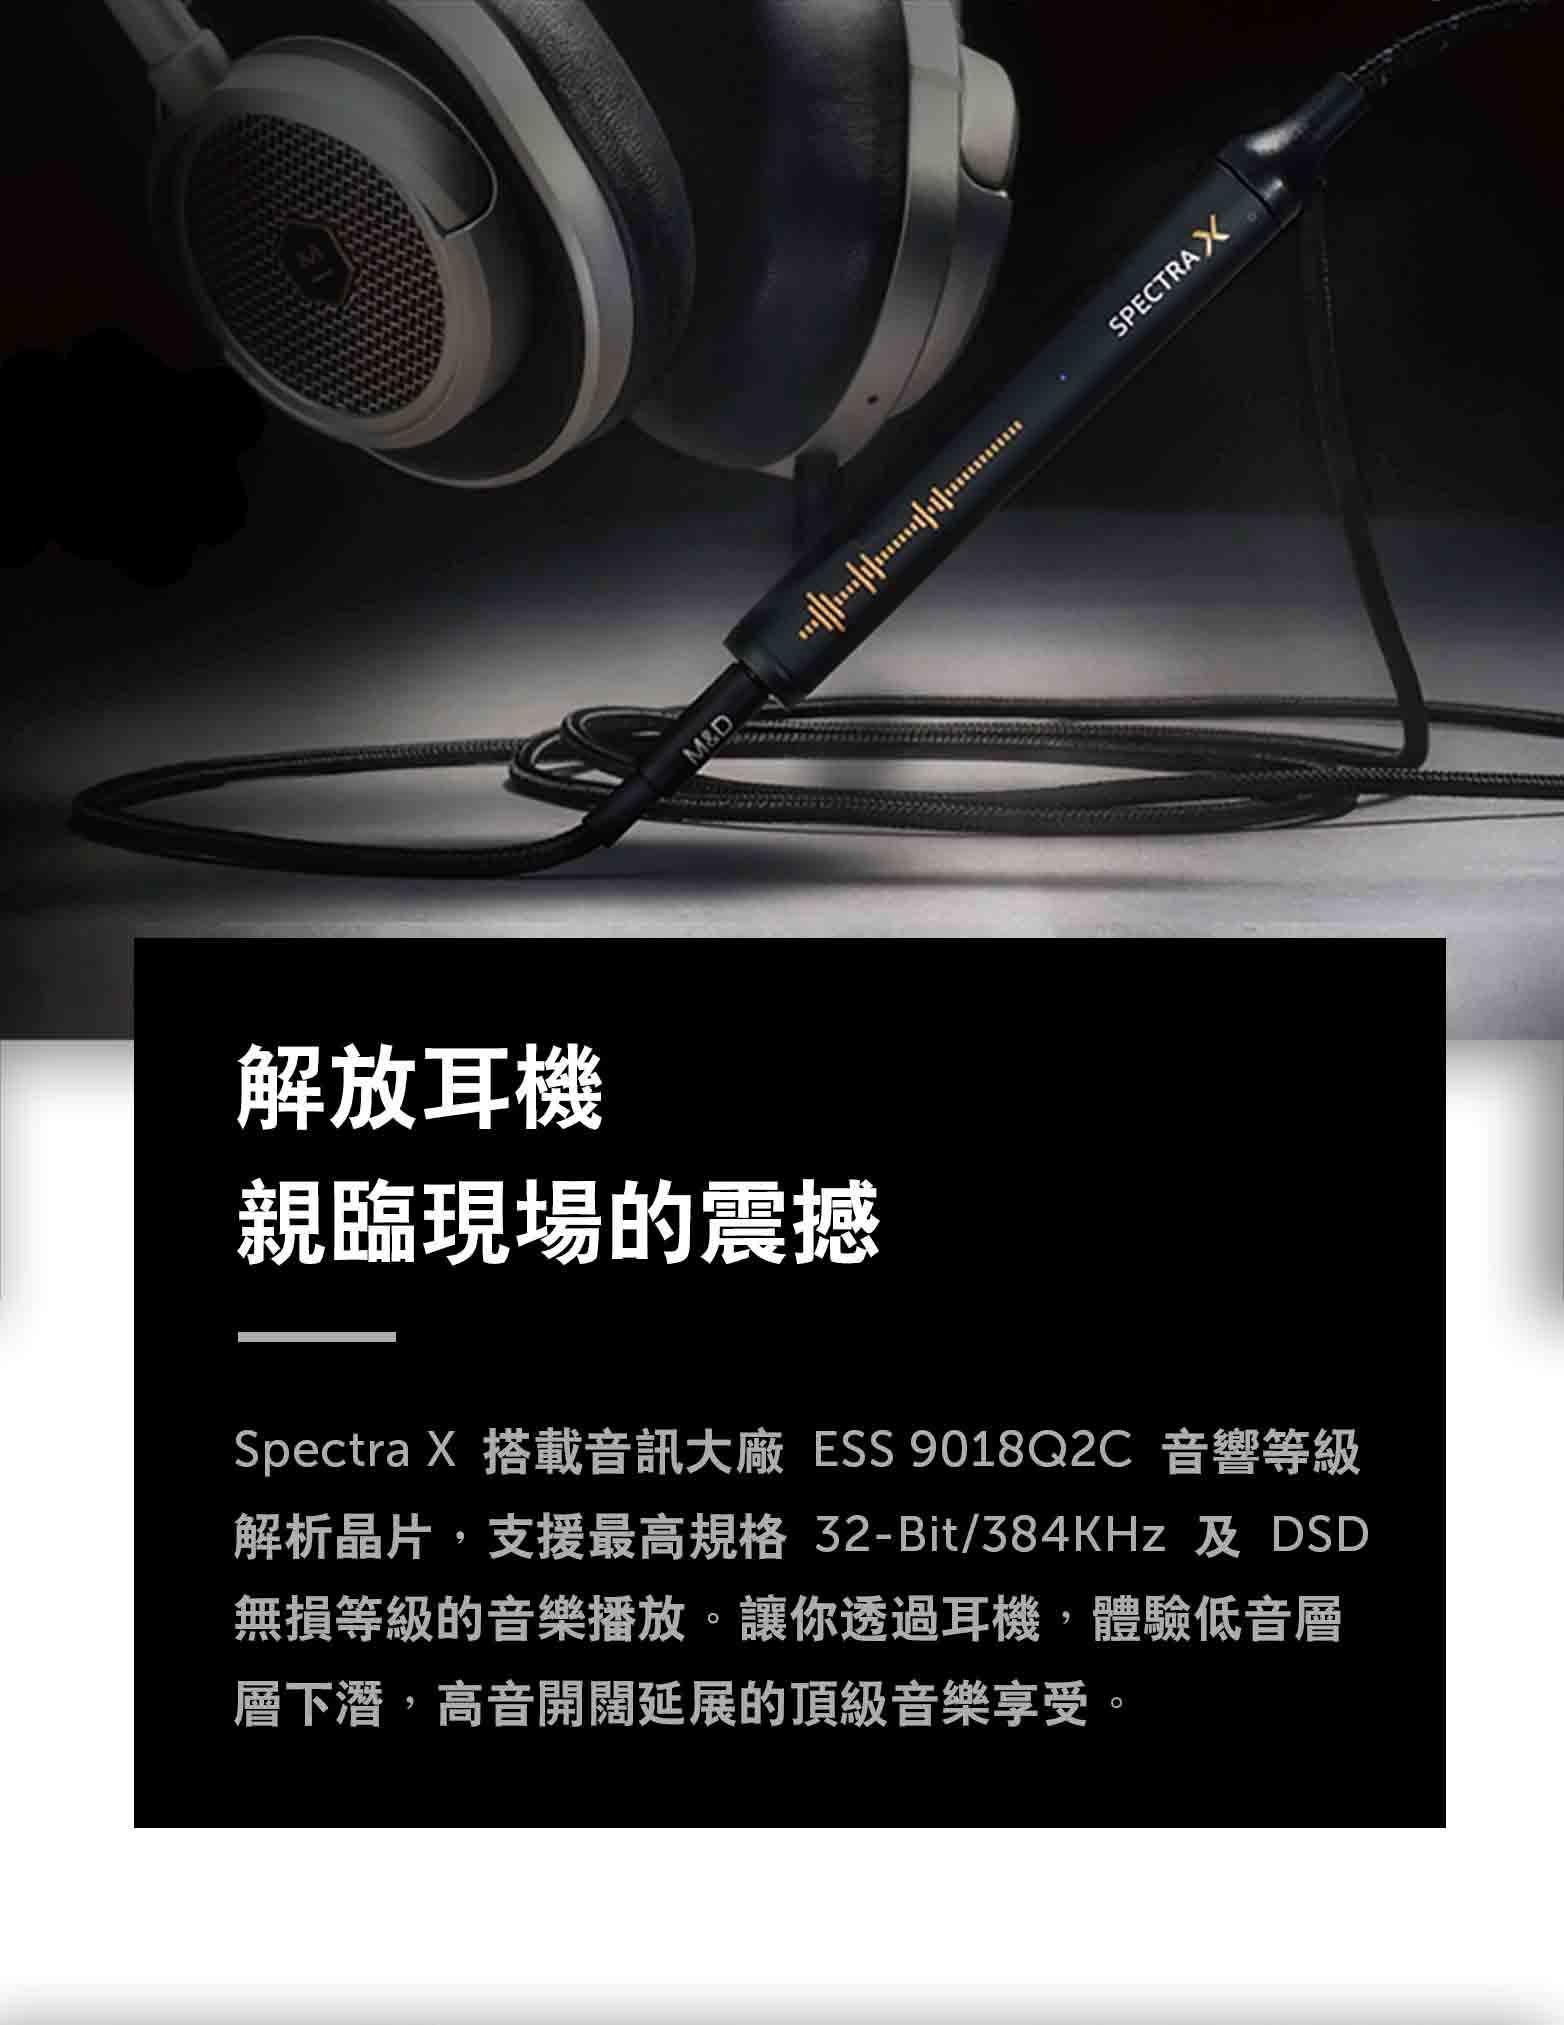 Spectra_X_美聲驅動引擎_智慧音效引擎 3